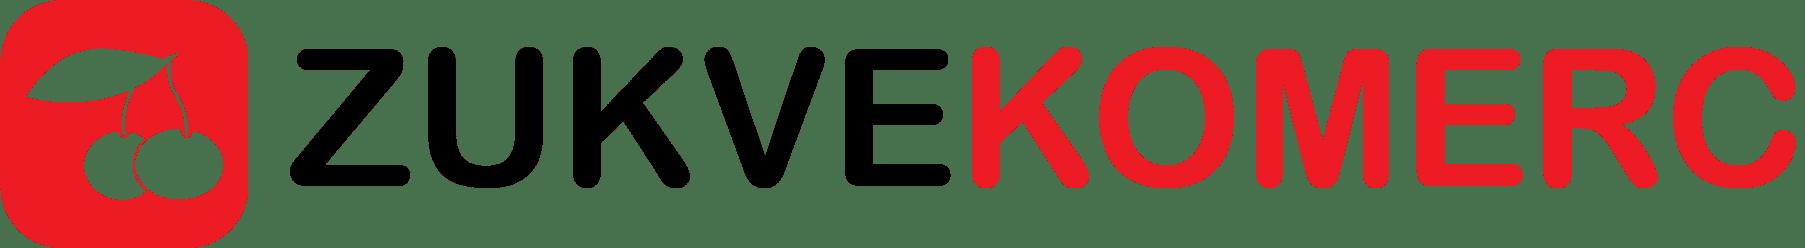 zukve-komerc-logo-online